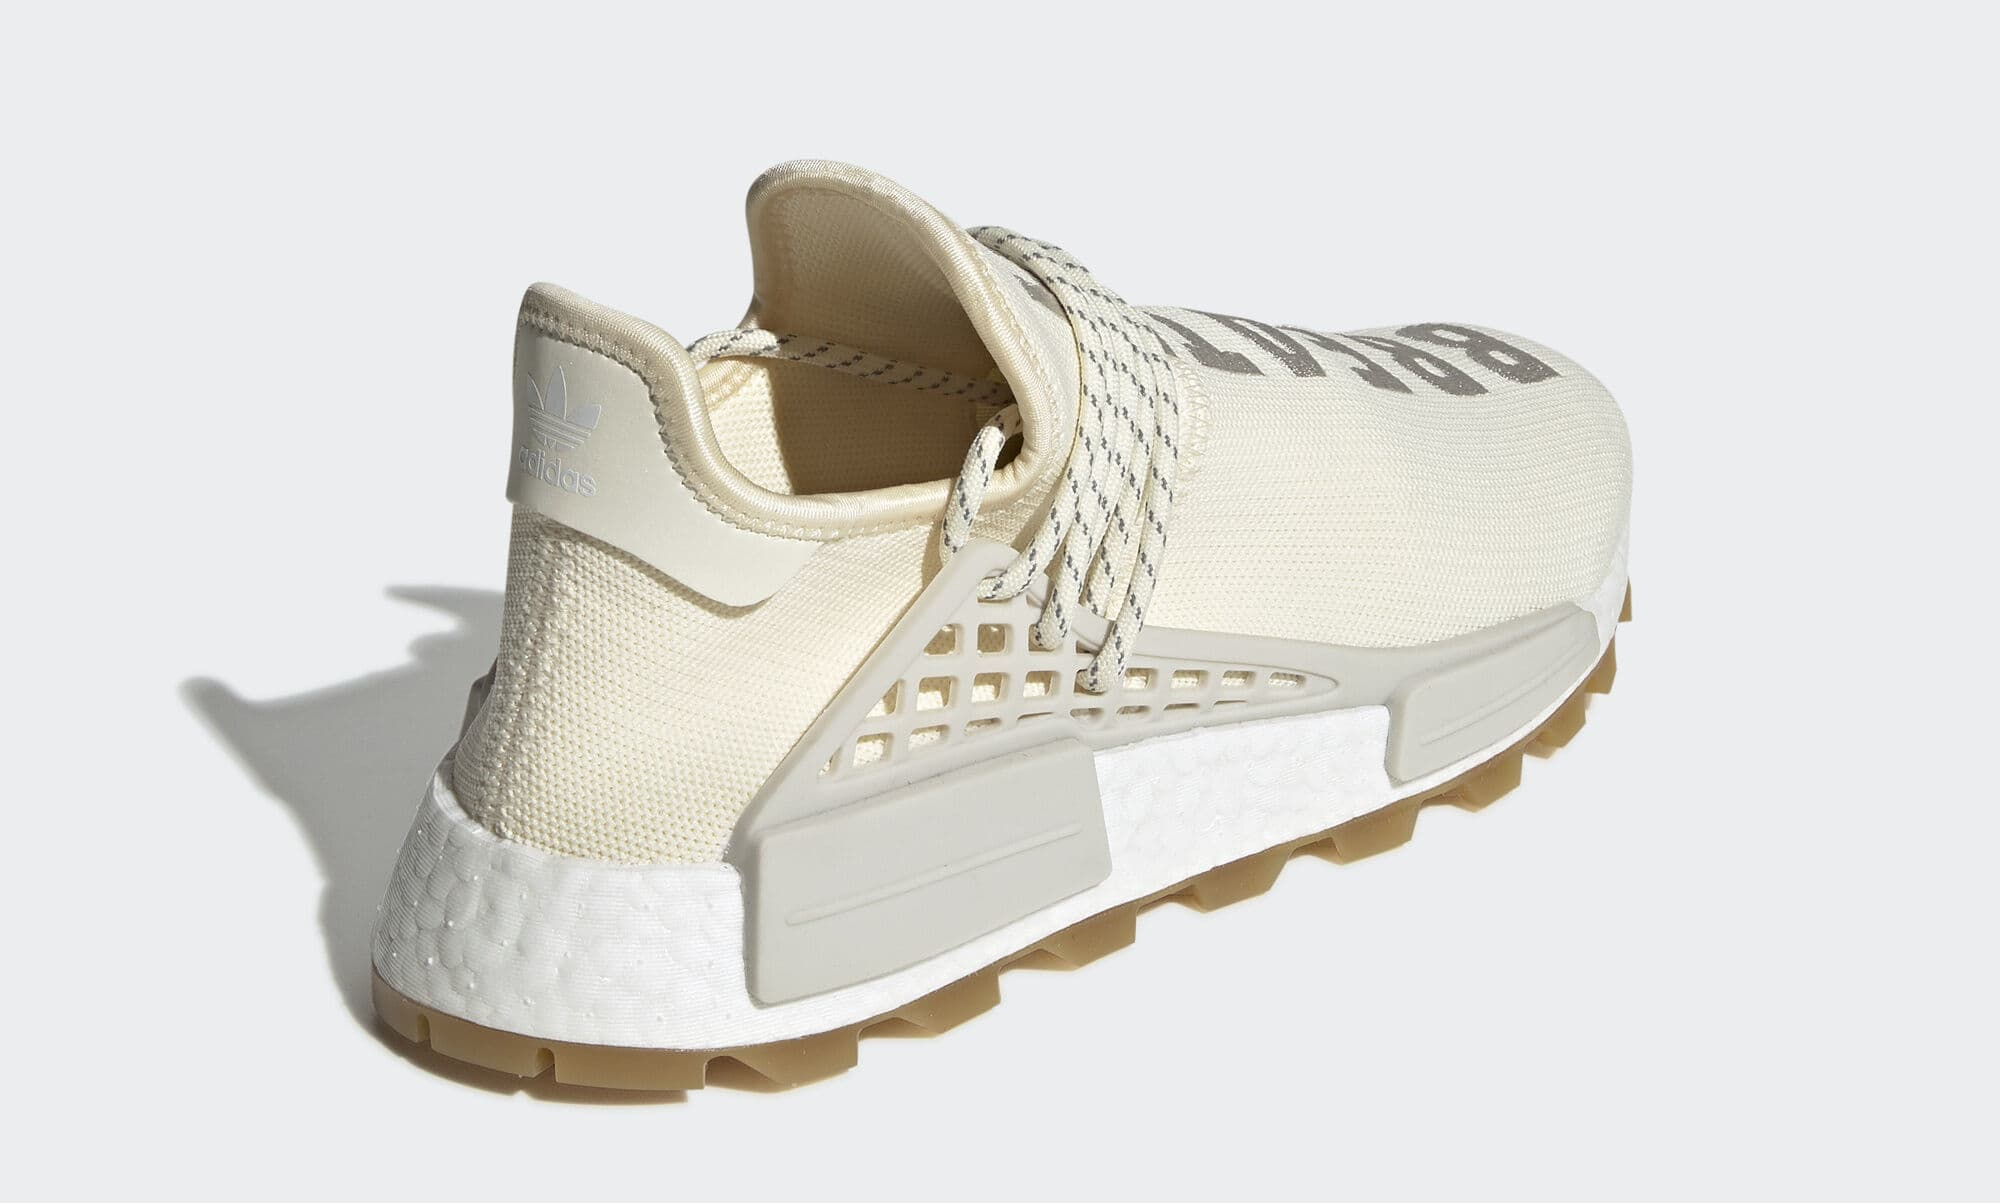 Pharrell x Adidas NMD Hu 'Gum' EG7737 (Talon)